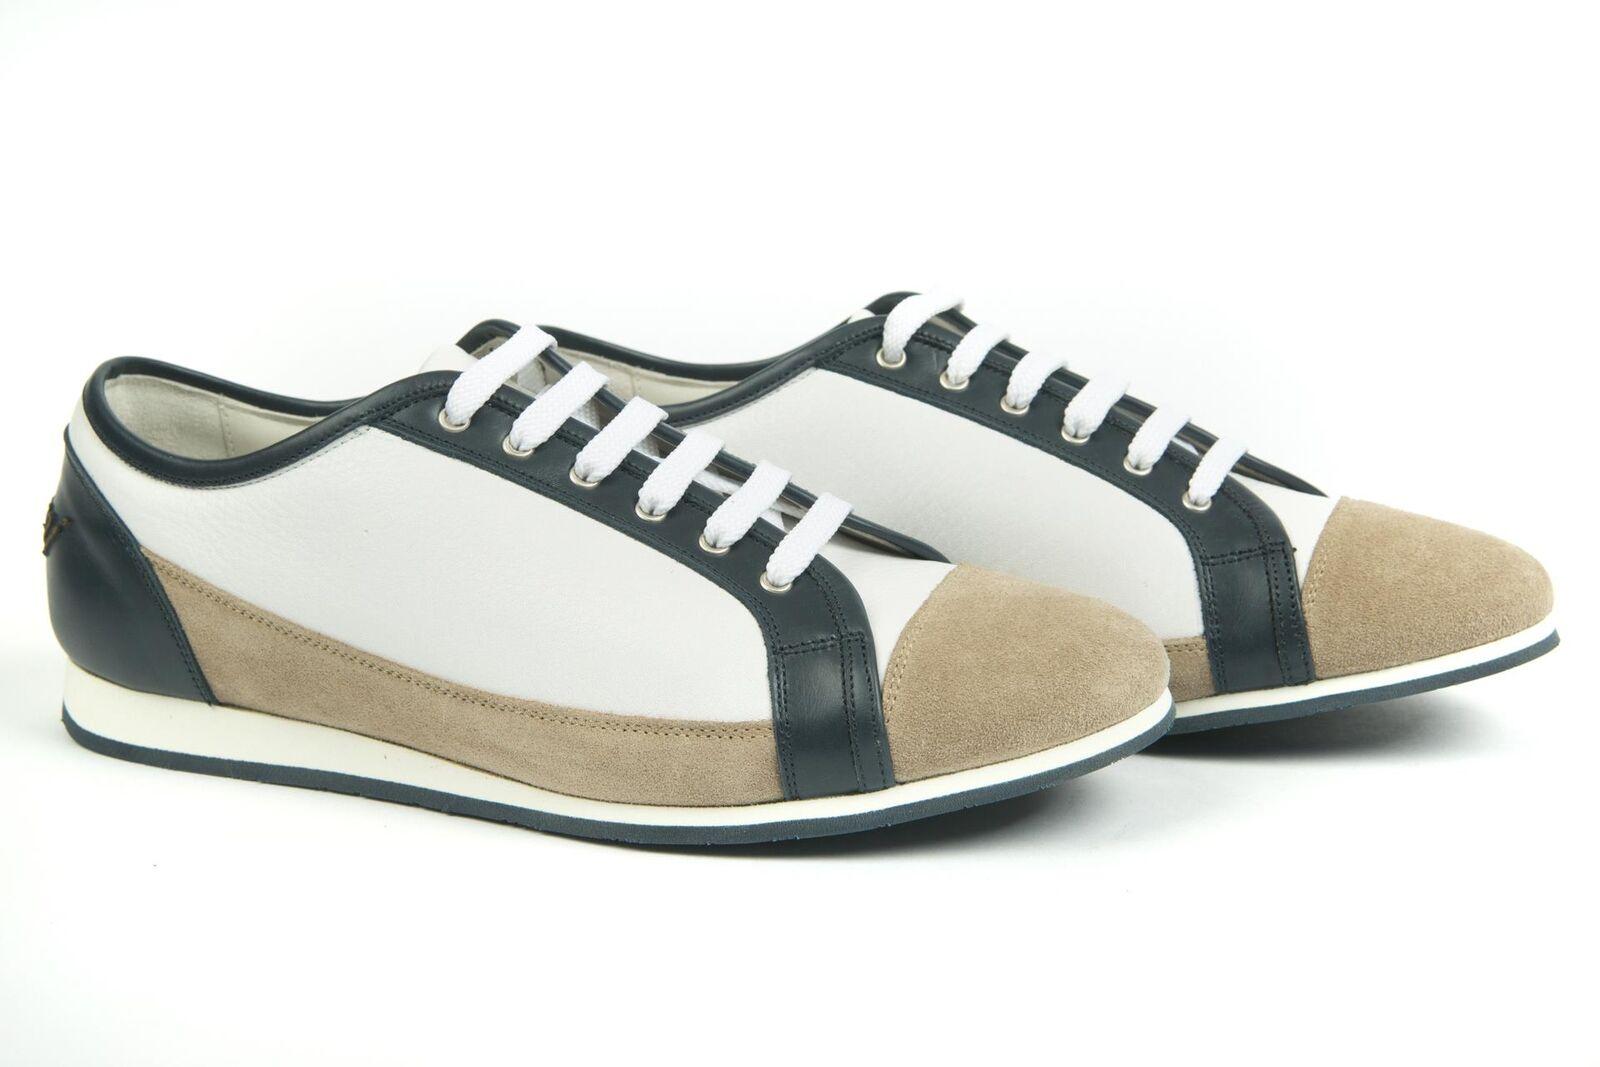 Brioni  825 NIB White Navy bluee Leather Suede Fashion Sneakers shoes 42 EU 9 US